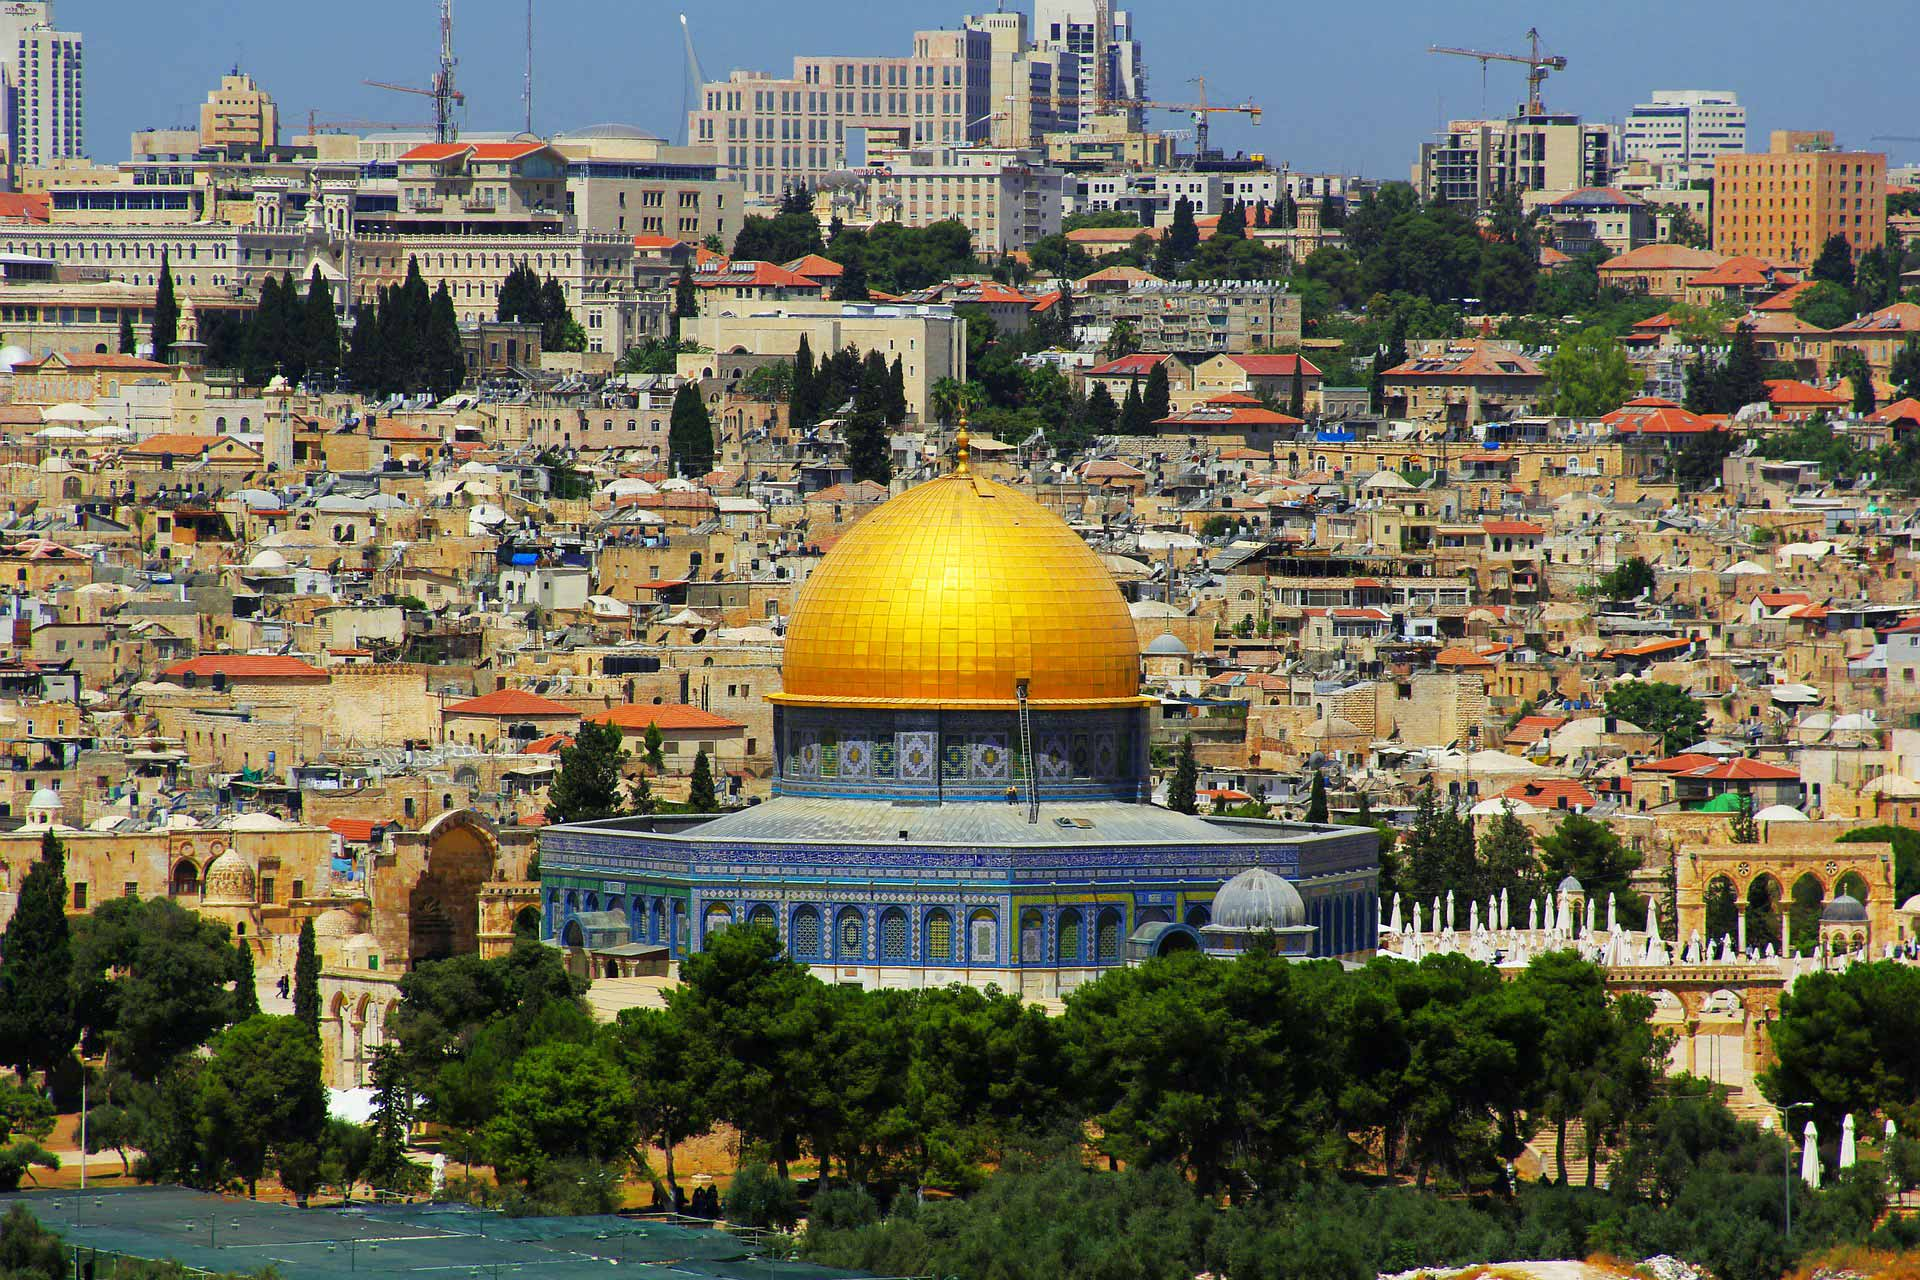 Israel Jerusalem The Dome of the Rock - Arabic قبة الصخرة Qubbat al-Sakhrah - Hebrew כיפת הסלע Kippat ha-Sela